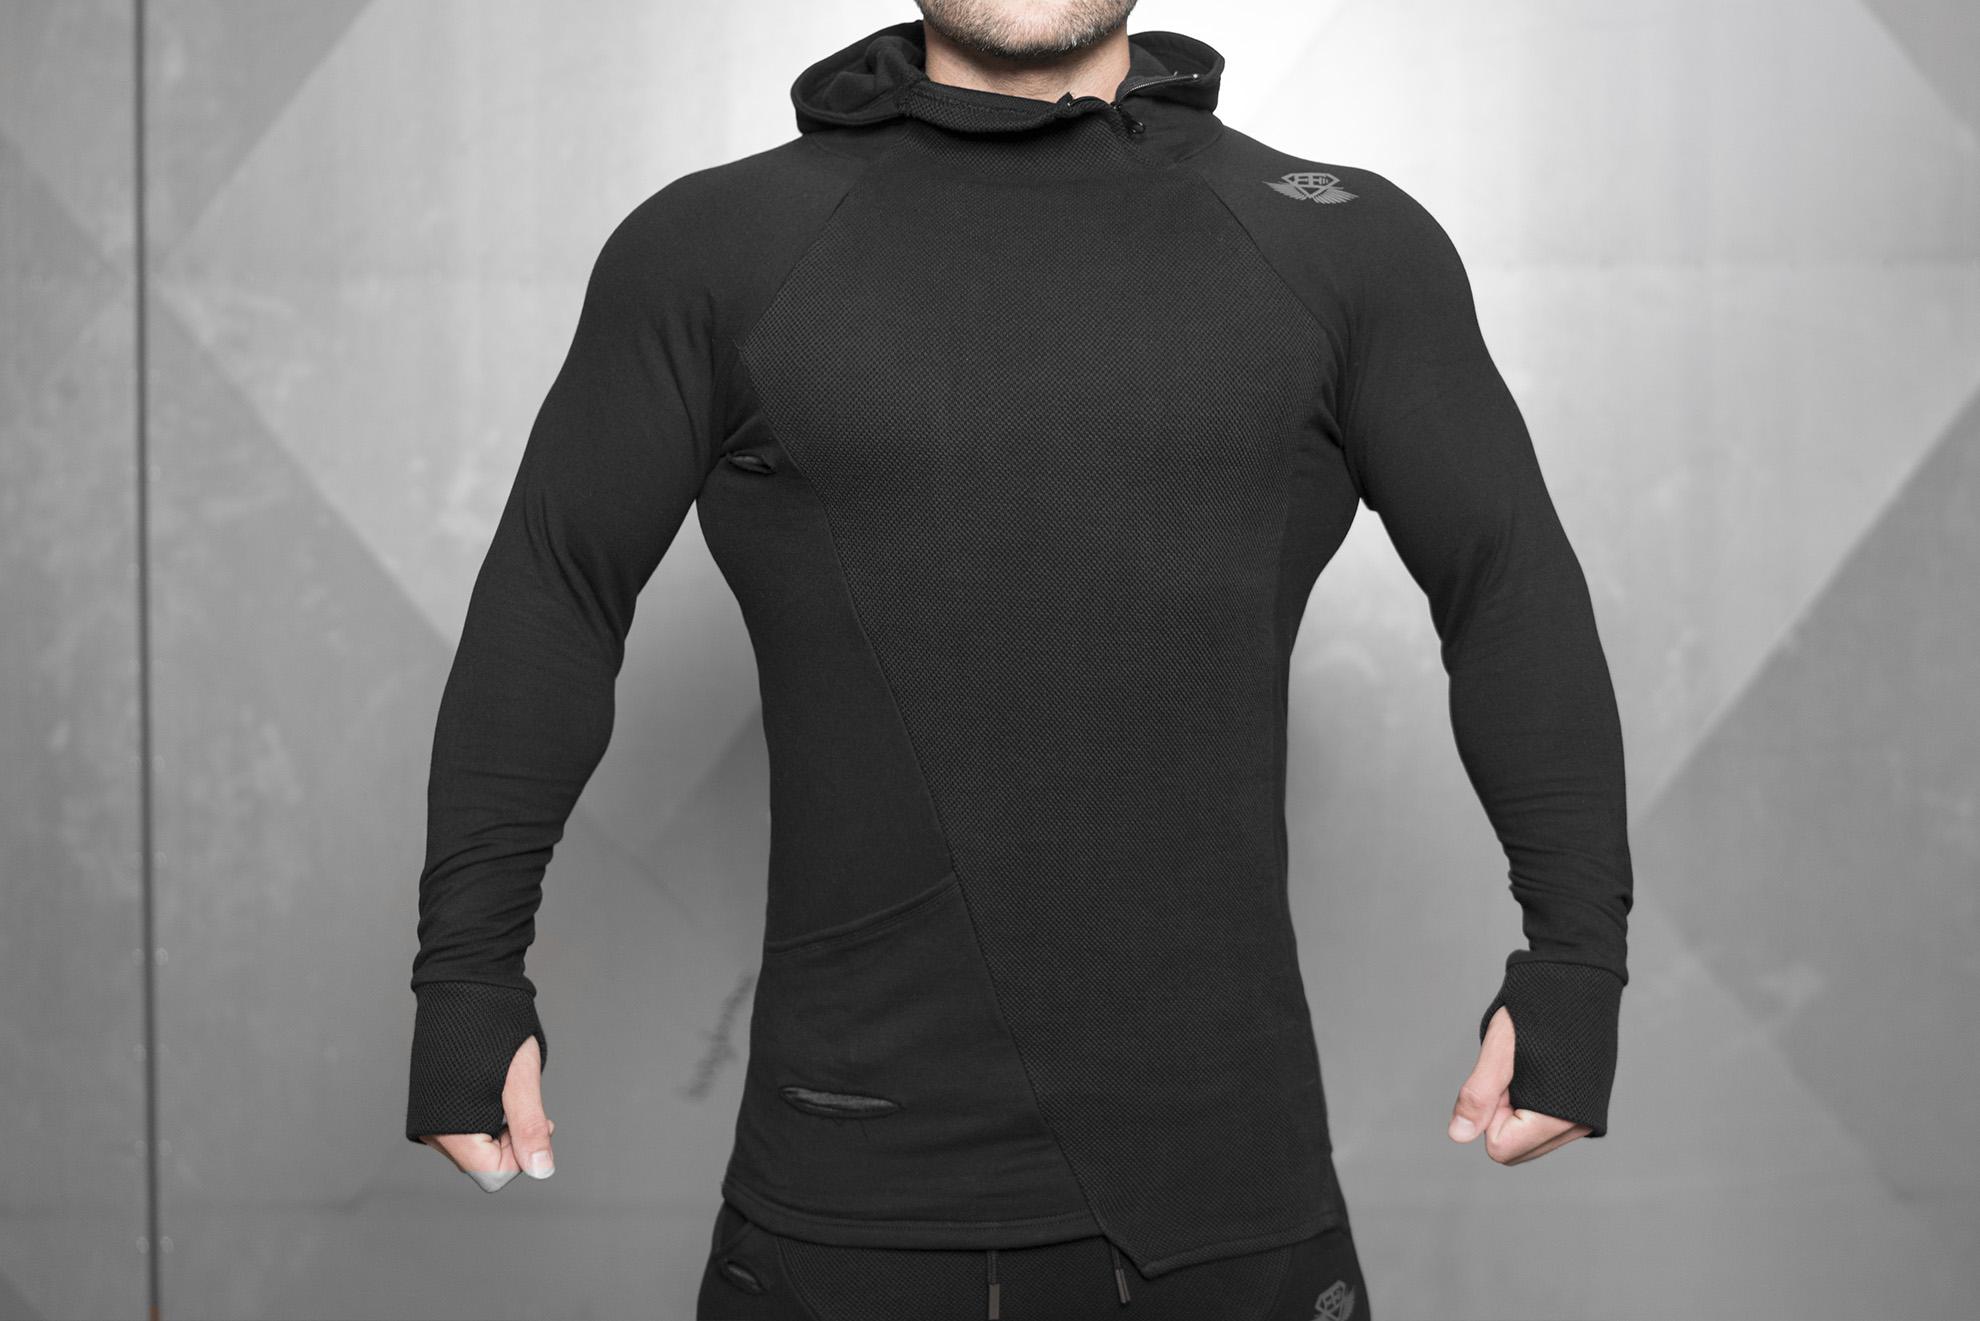 SVGE FENRIR Prometheus Vest - Black